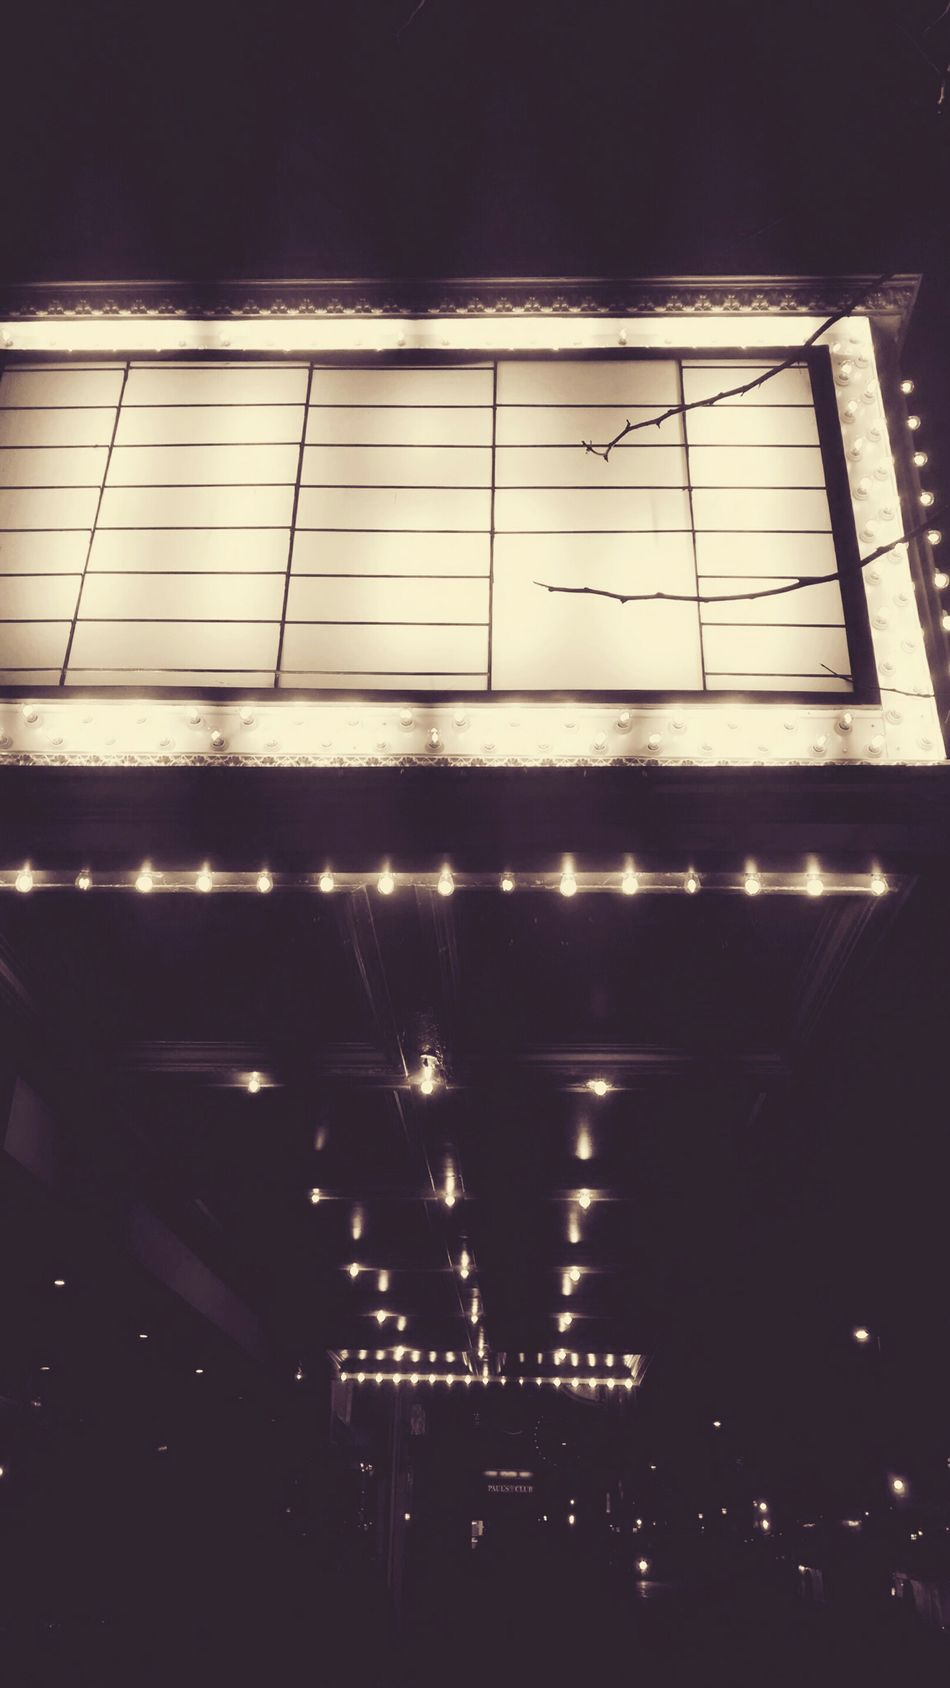 Atthemovies Wemissedit Vintageperfection Marquee Theater Madison